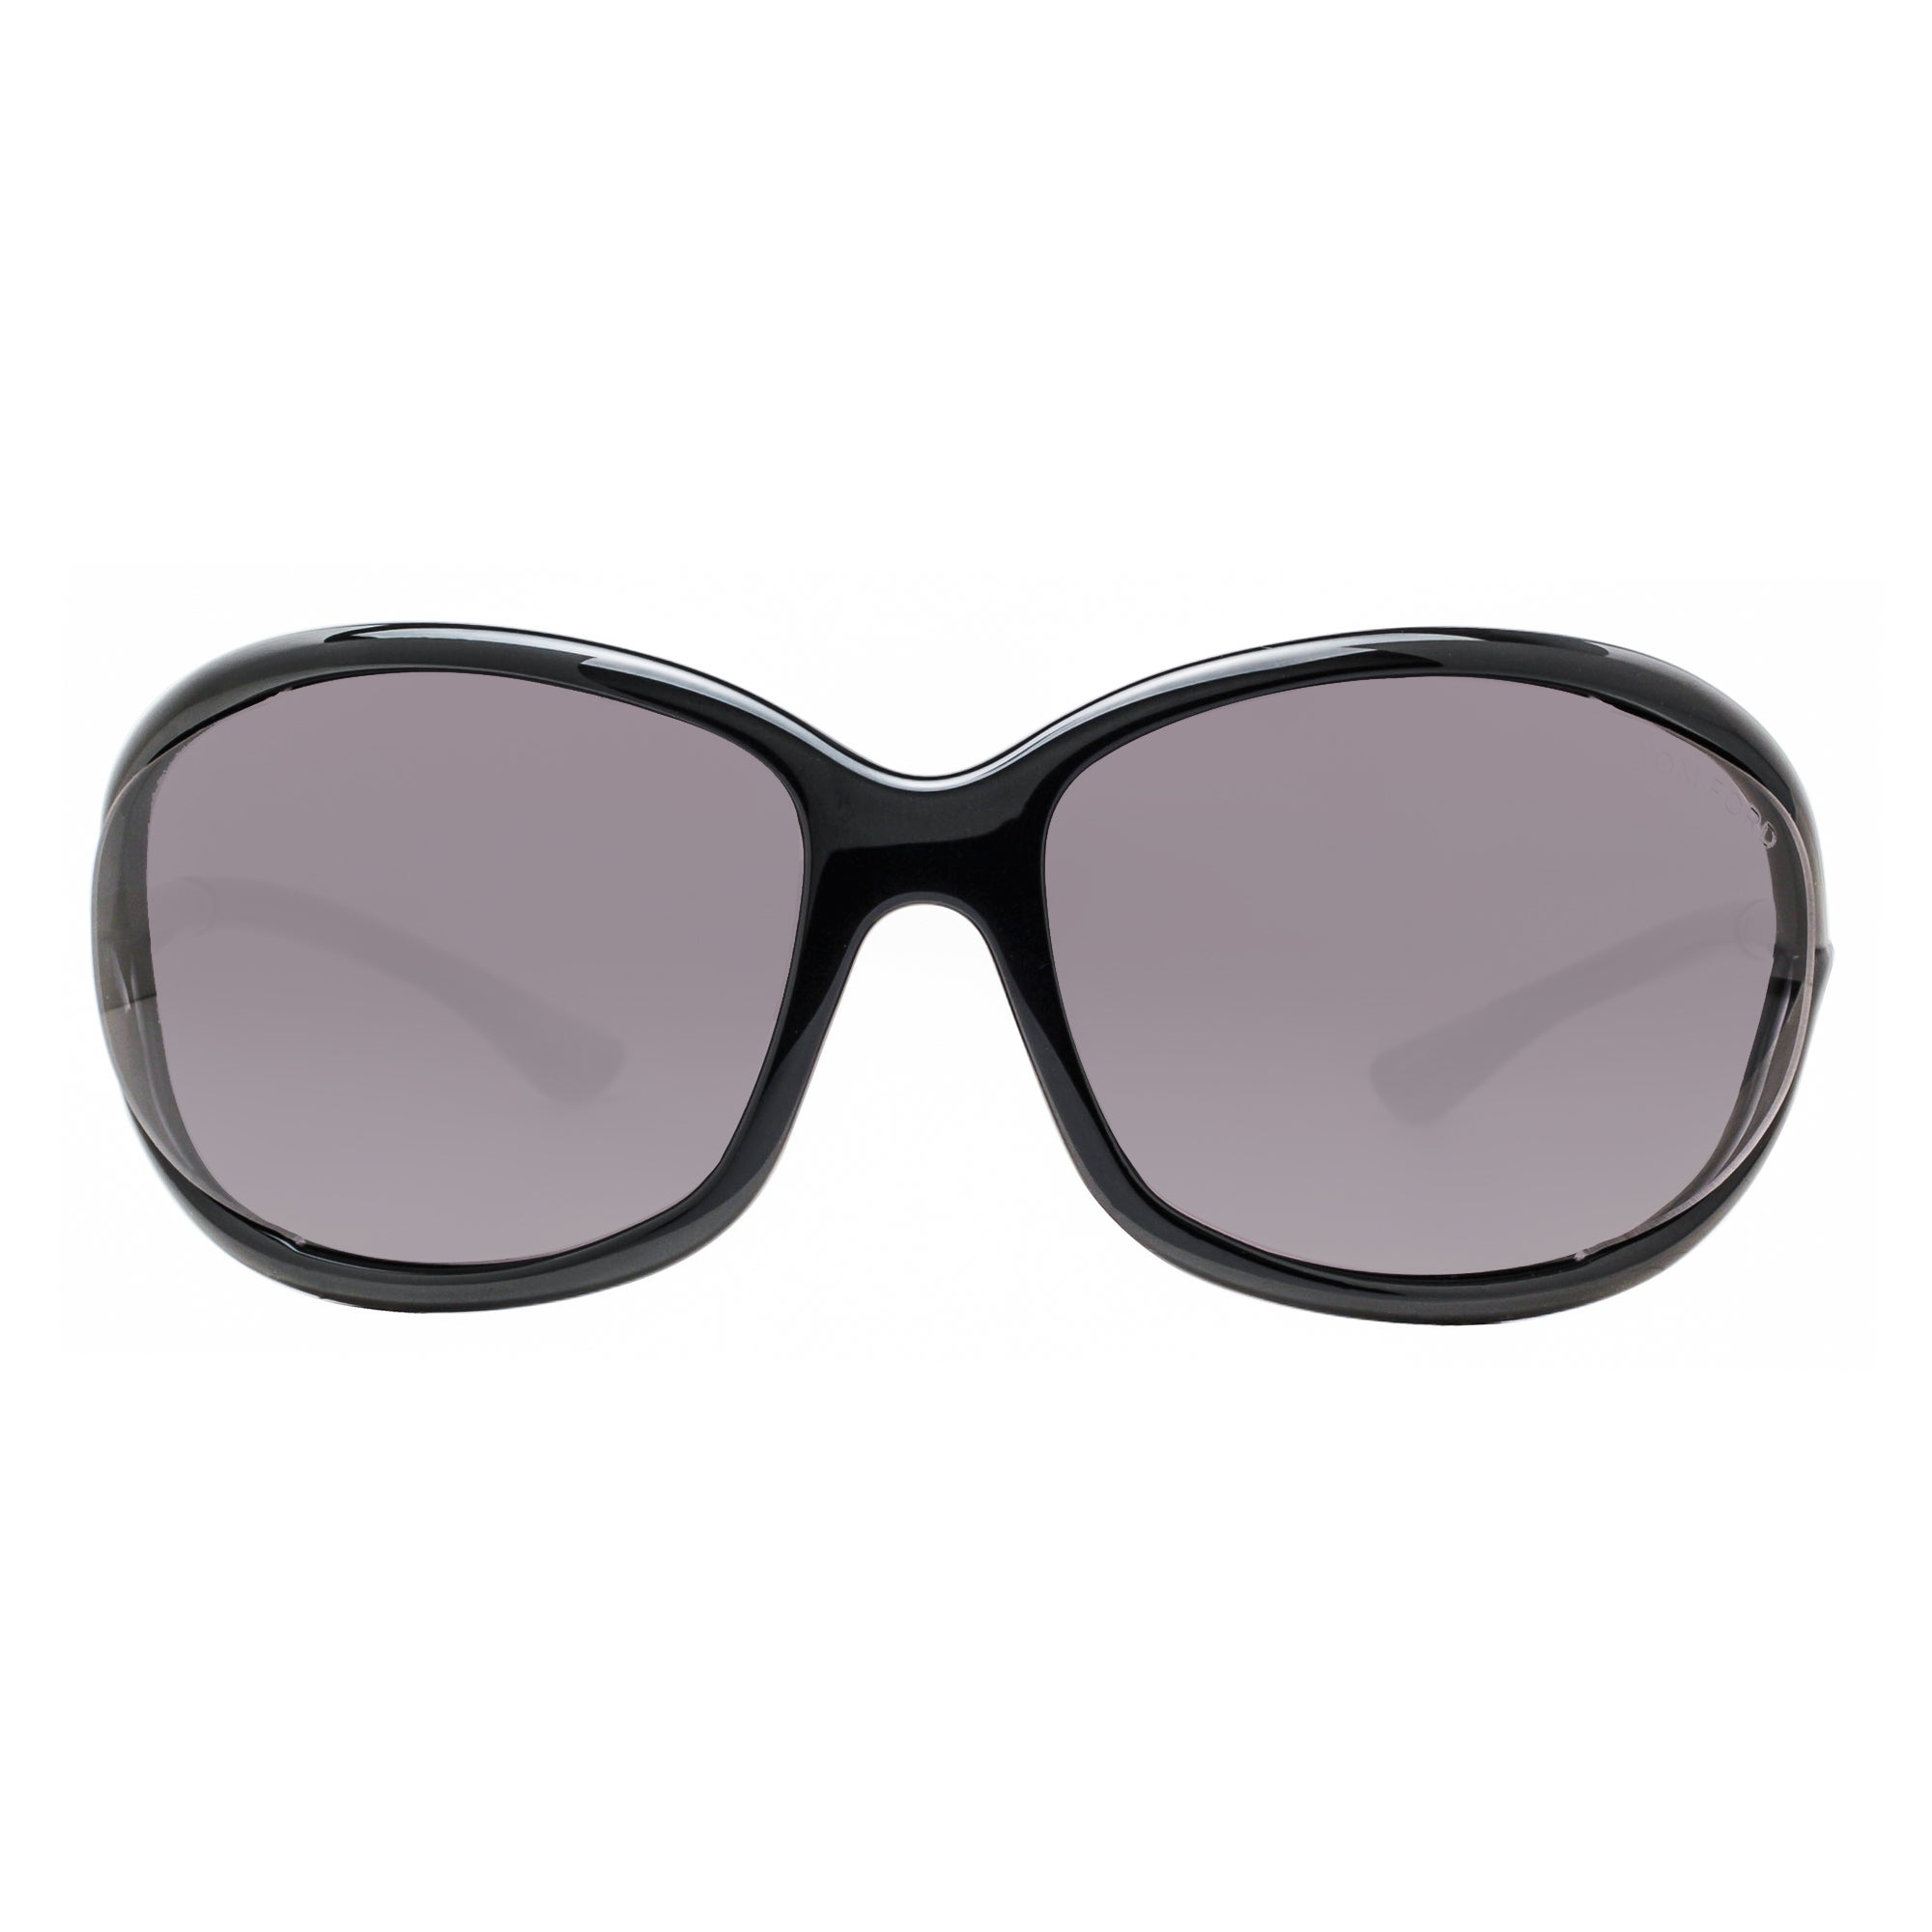 5b9d8449806 Shop Tom Ford Jennifer TF 8 199 Shiny Black Smoke Gray Women s Soft Square  Sunglasses - Shiny Black - 61mm-16mm-120mm - Free Shipping Today -  Overstock.com ...